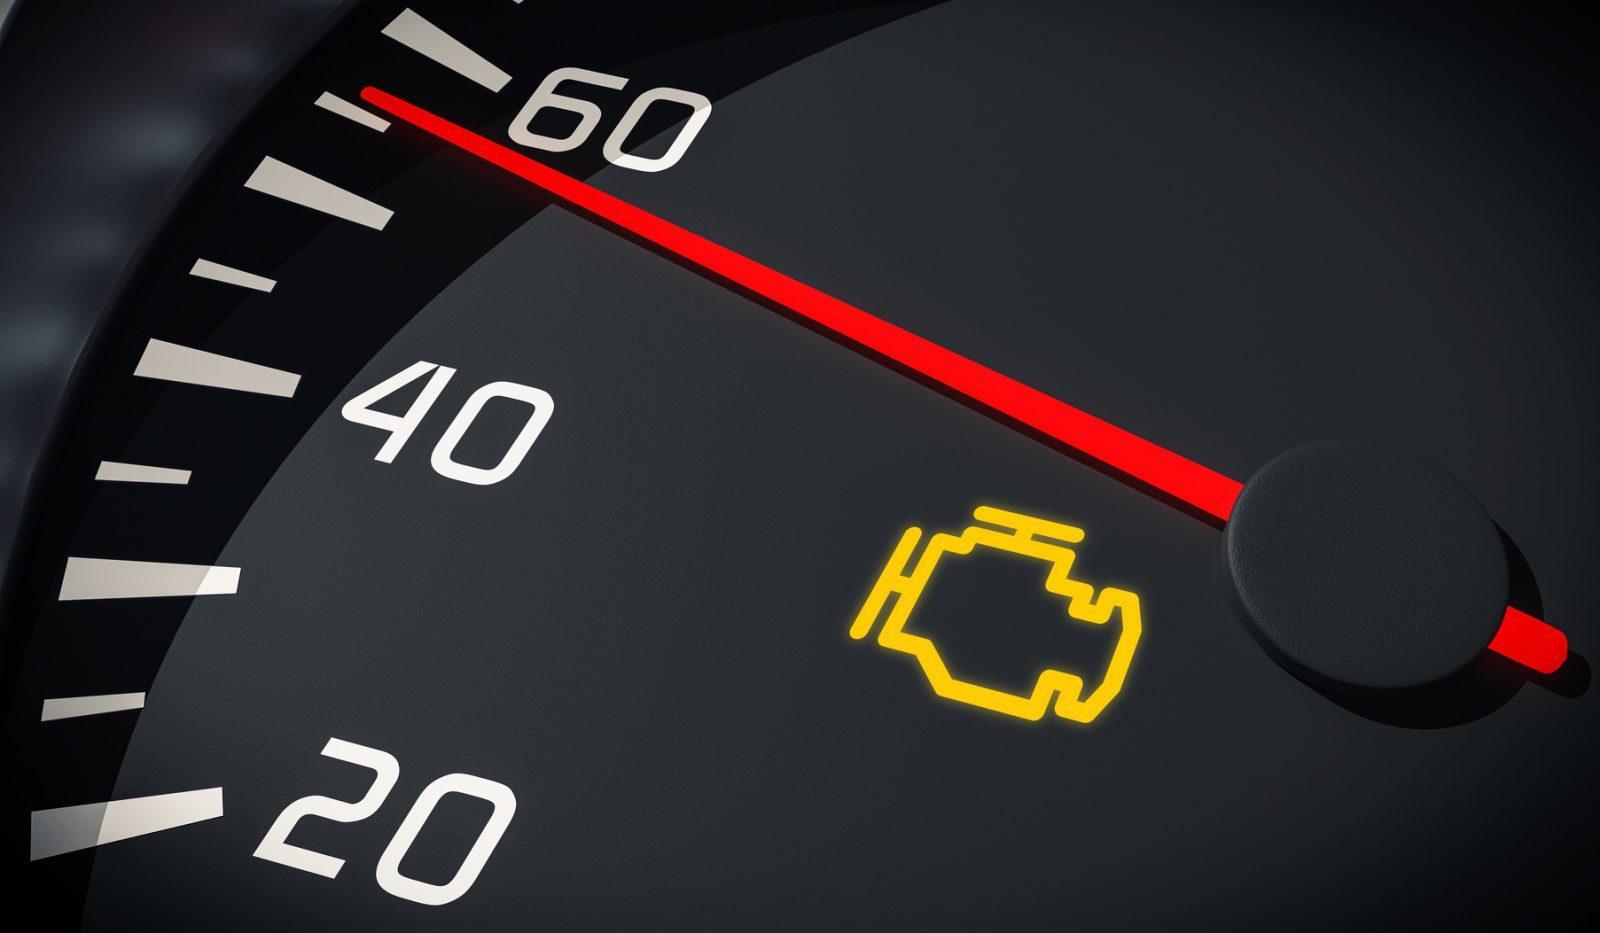 cara reset ecu grand new avanza spesifikasi veloz 2015 how to check engine light follow these 4 easy ways